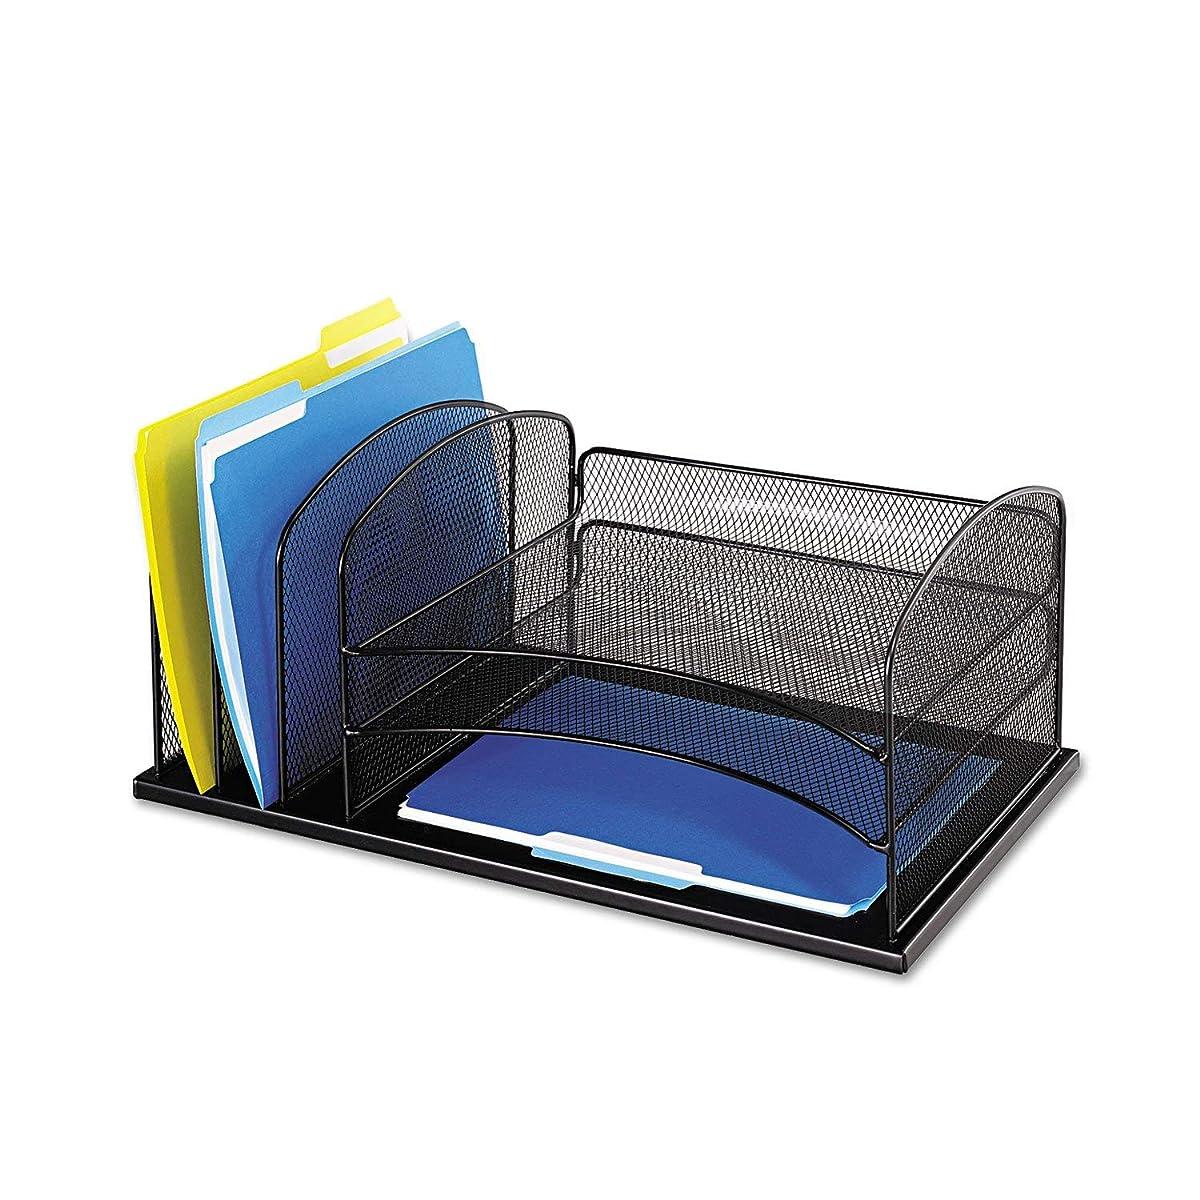 Safco Products Onyx Mesh 3 Sorter/3 Tray Desktop Organizer 3254BL, Black Powder Coat Finish, Durable Steel Mesh Construction